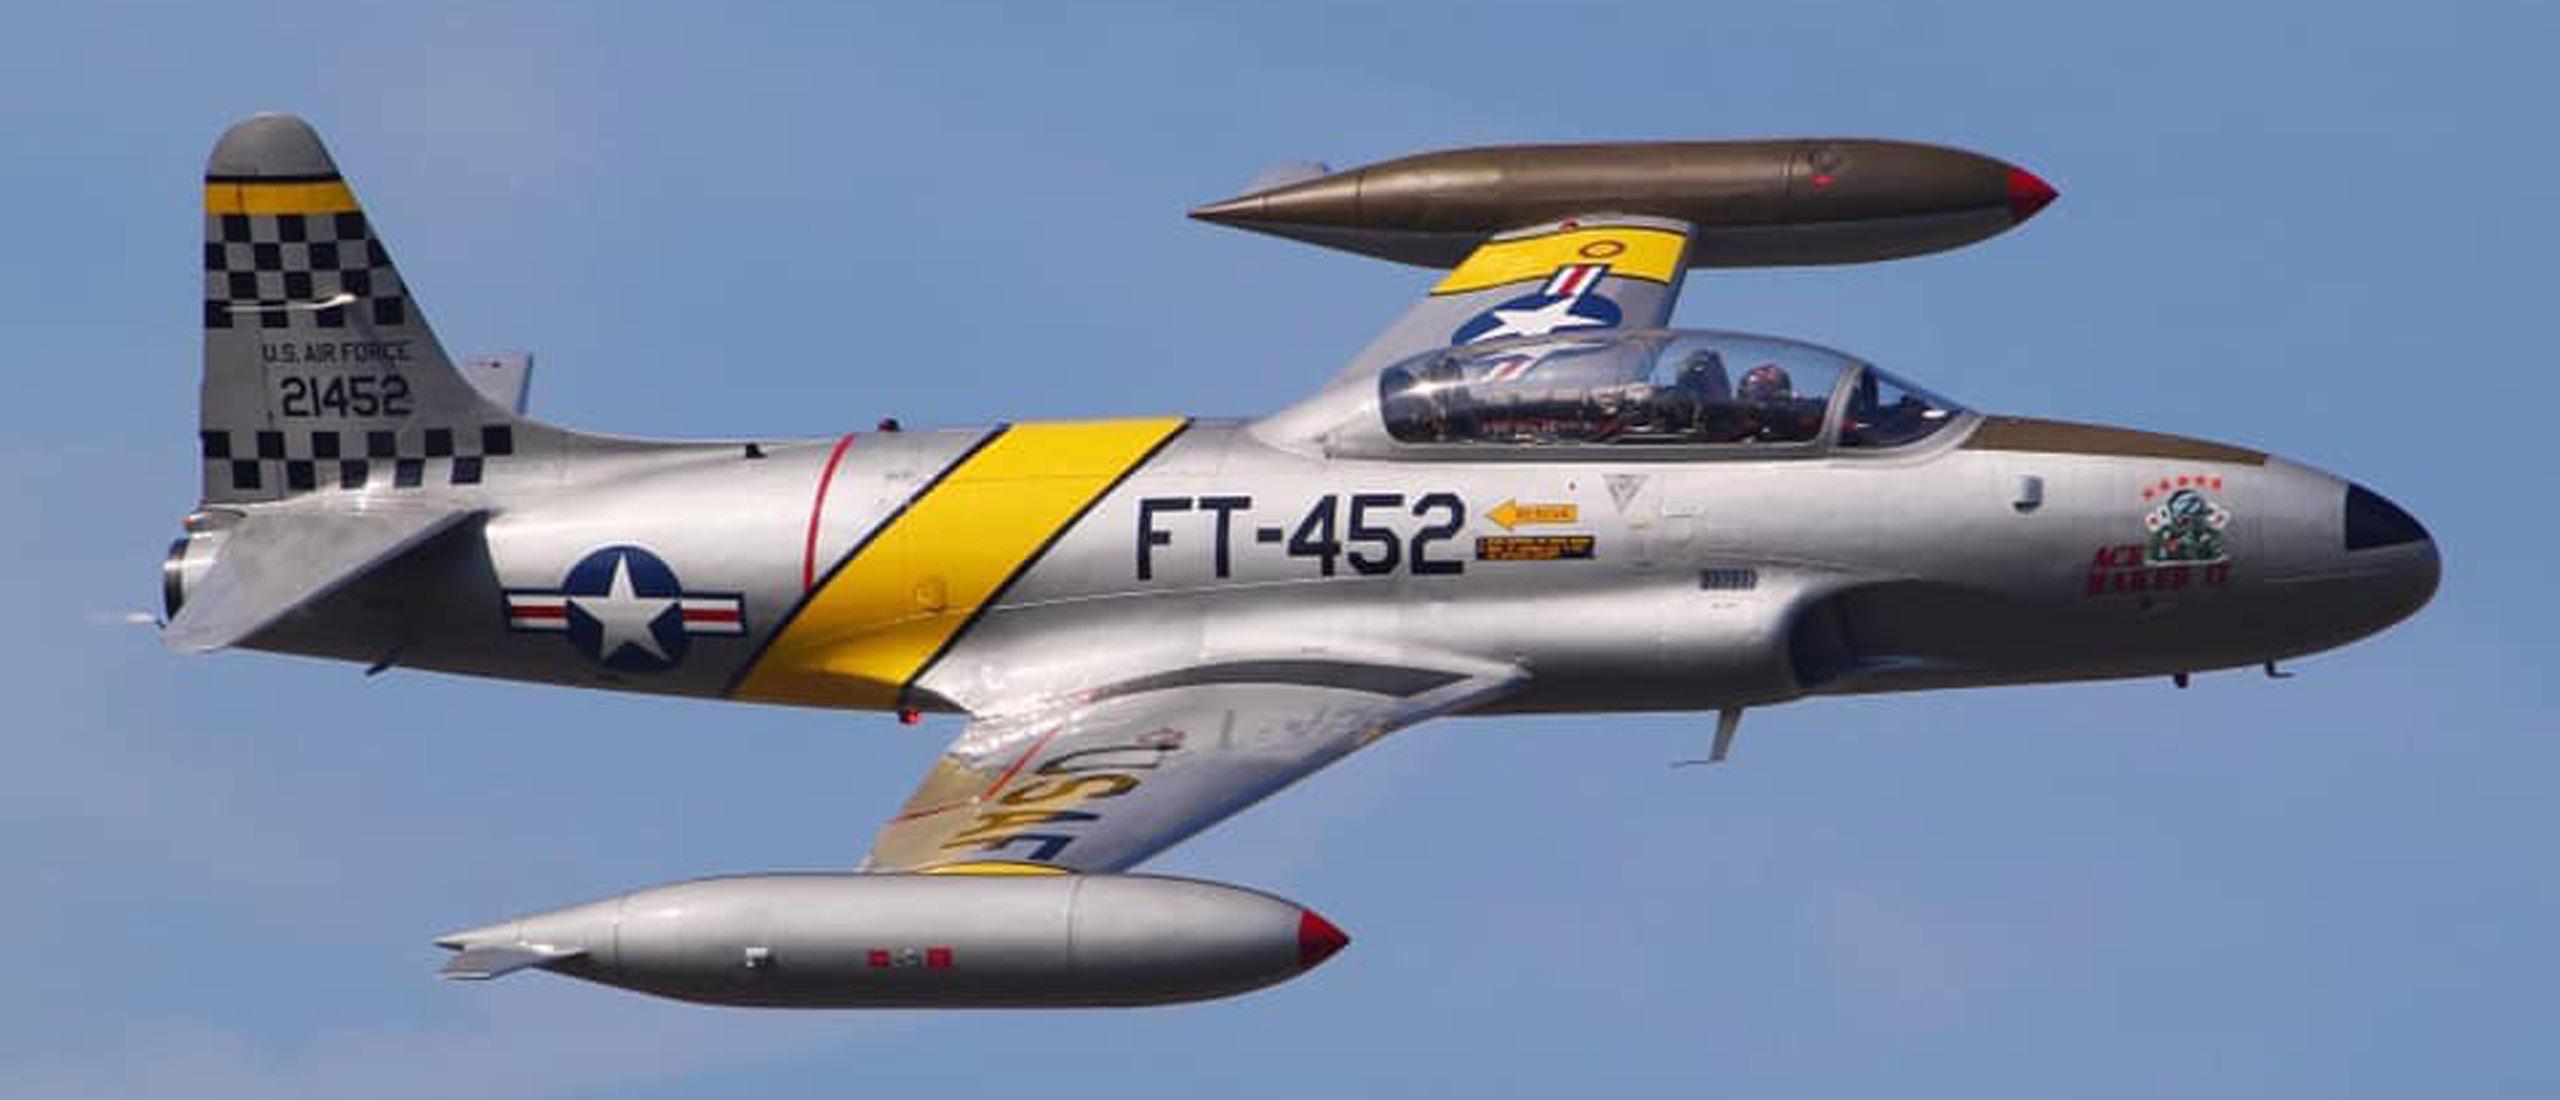 F-35A Lightning II, Vermont Air National Guard